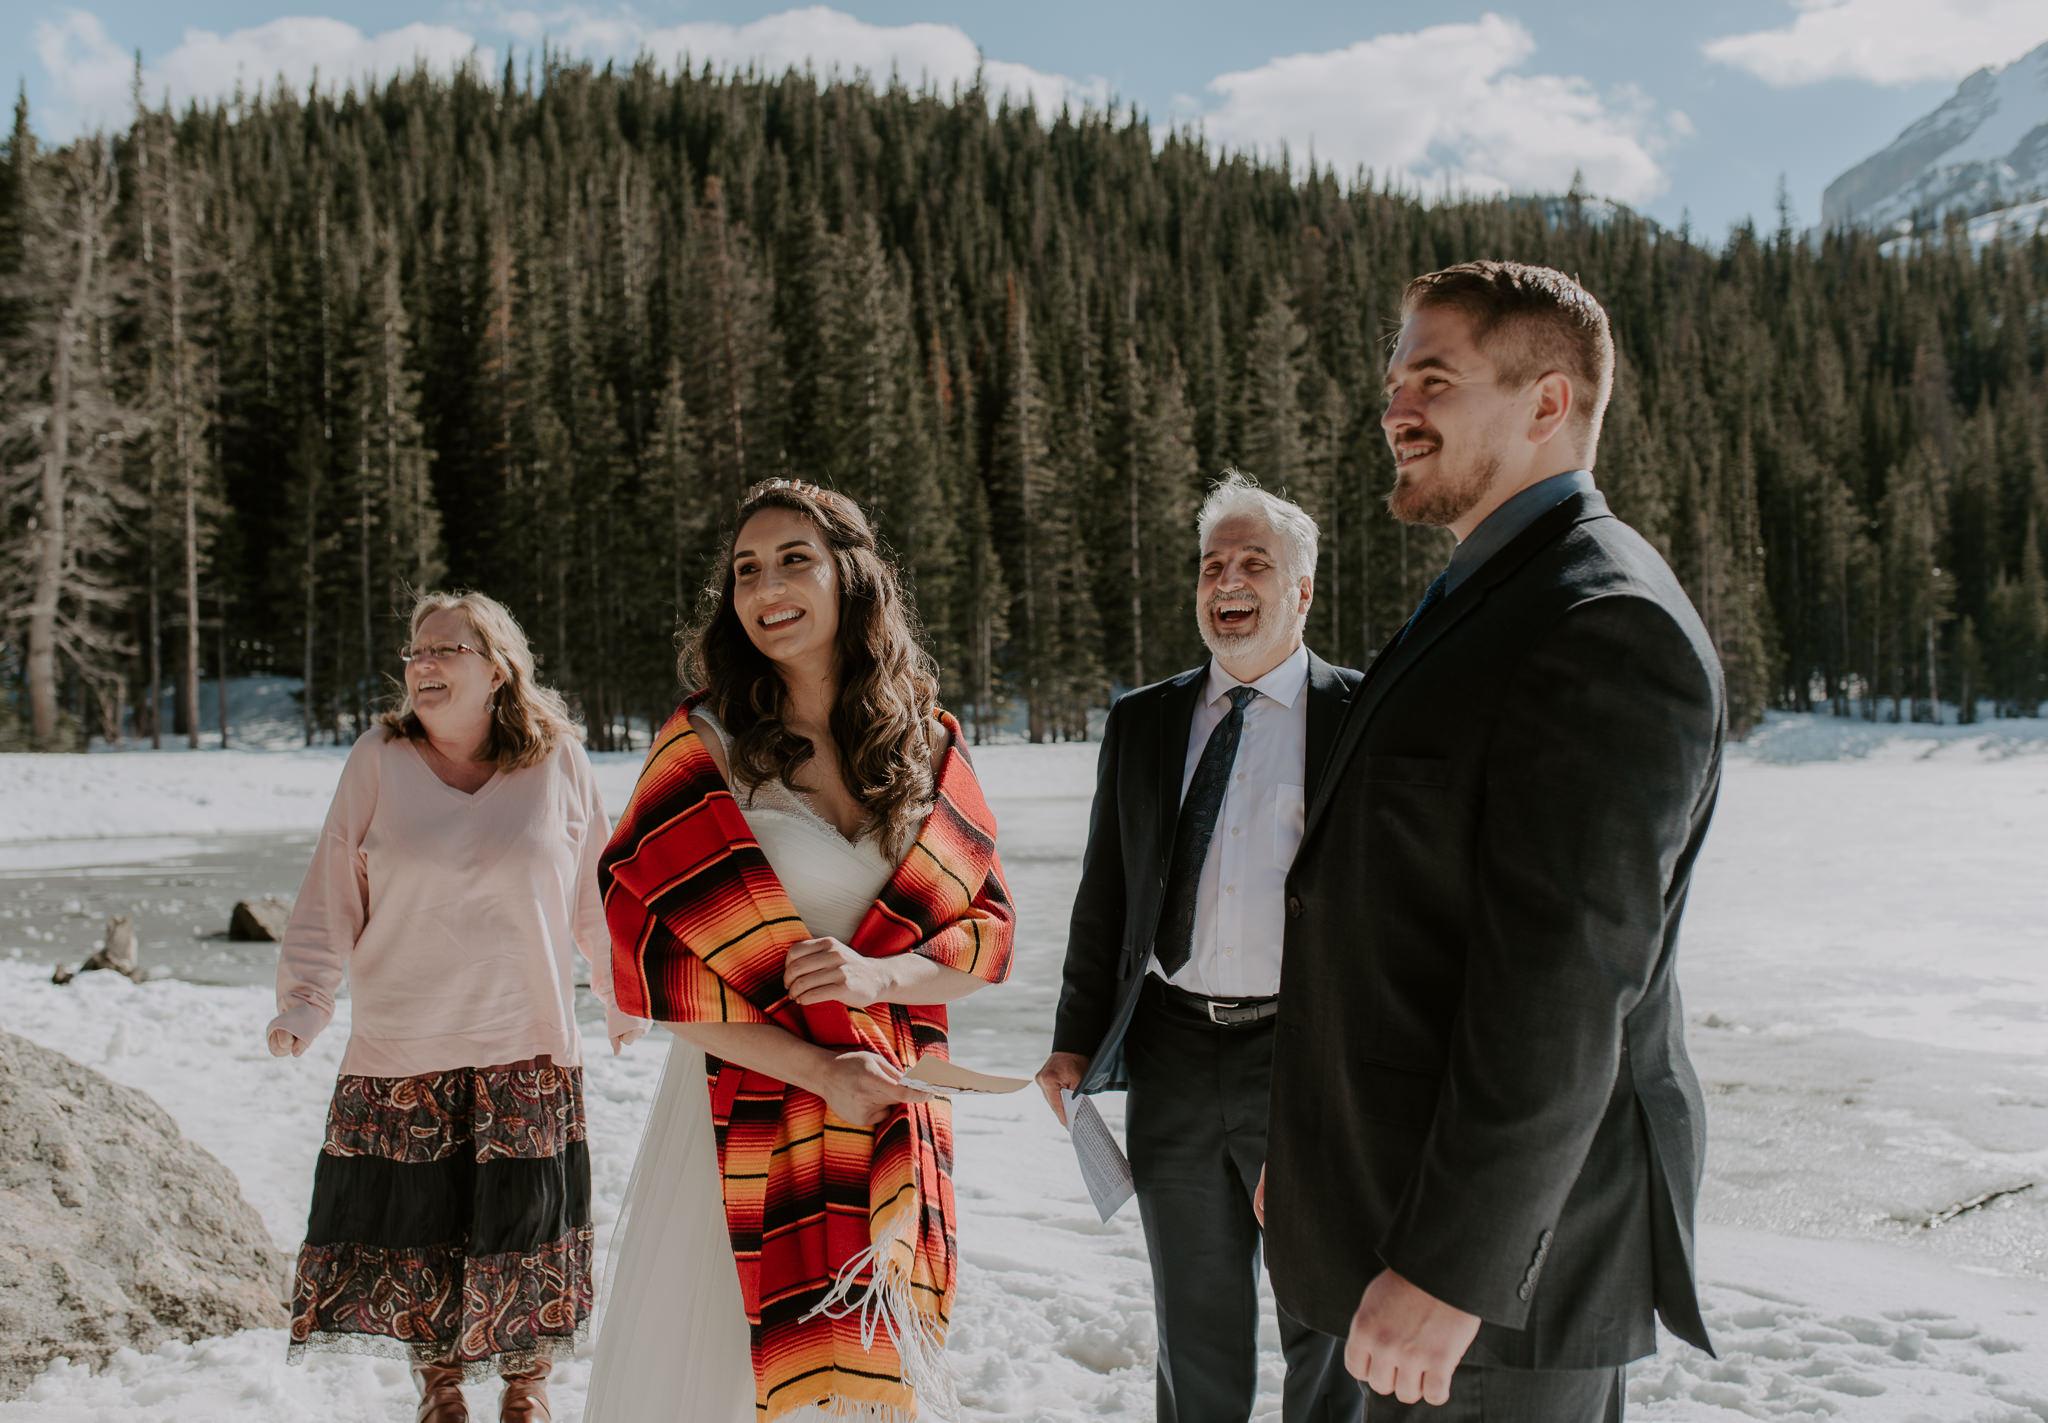 Bear Lake elopement in Rocky Mountain National Park photos.